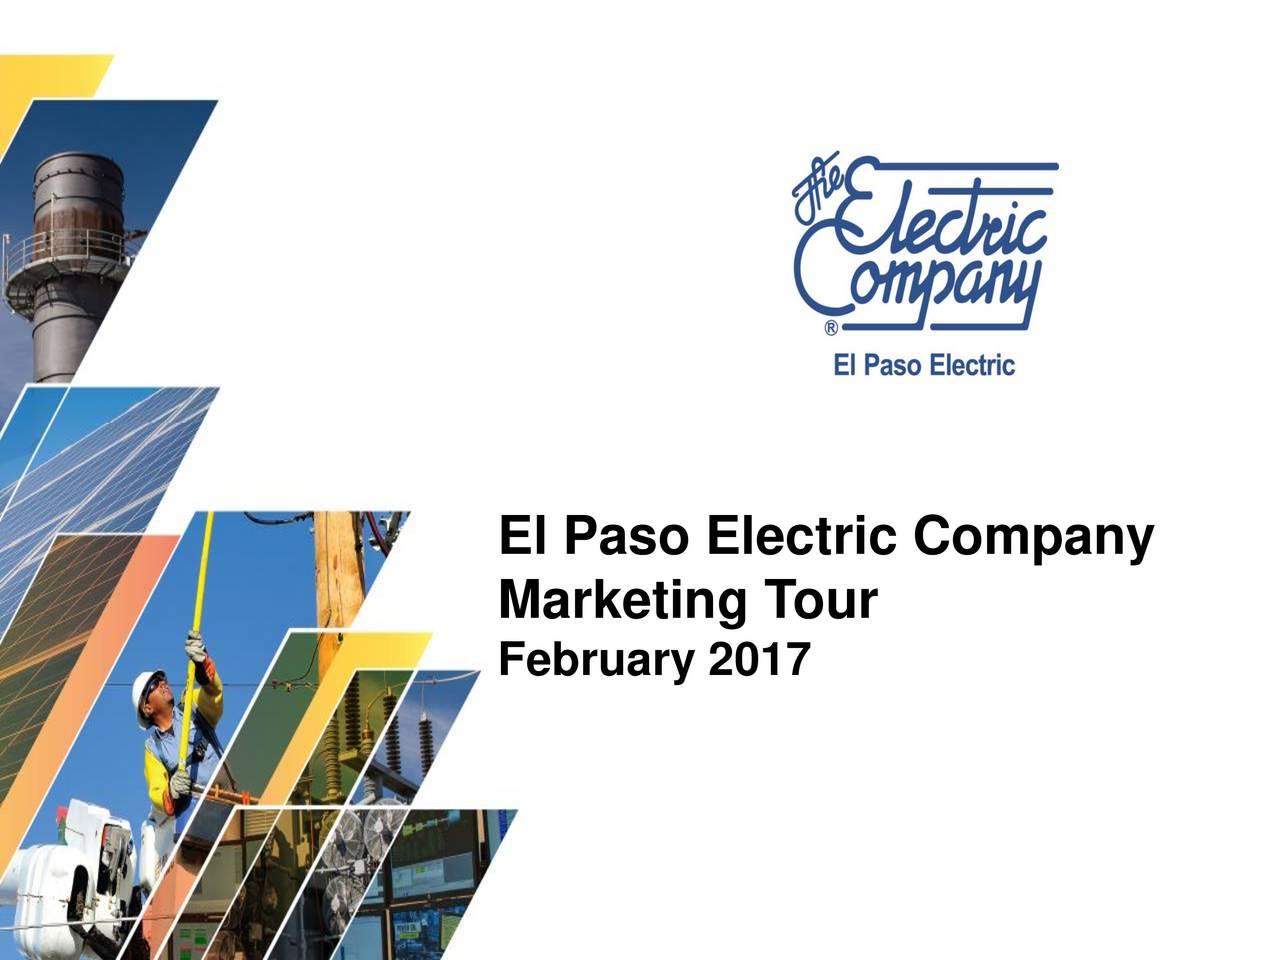 Marketing Tour February 2017